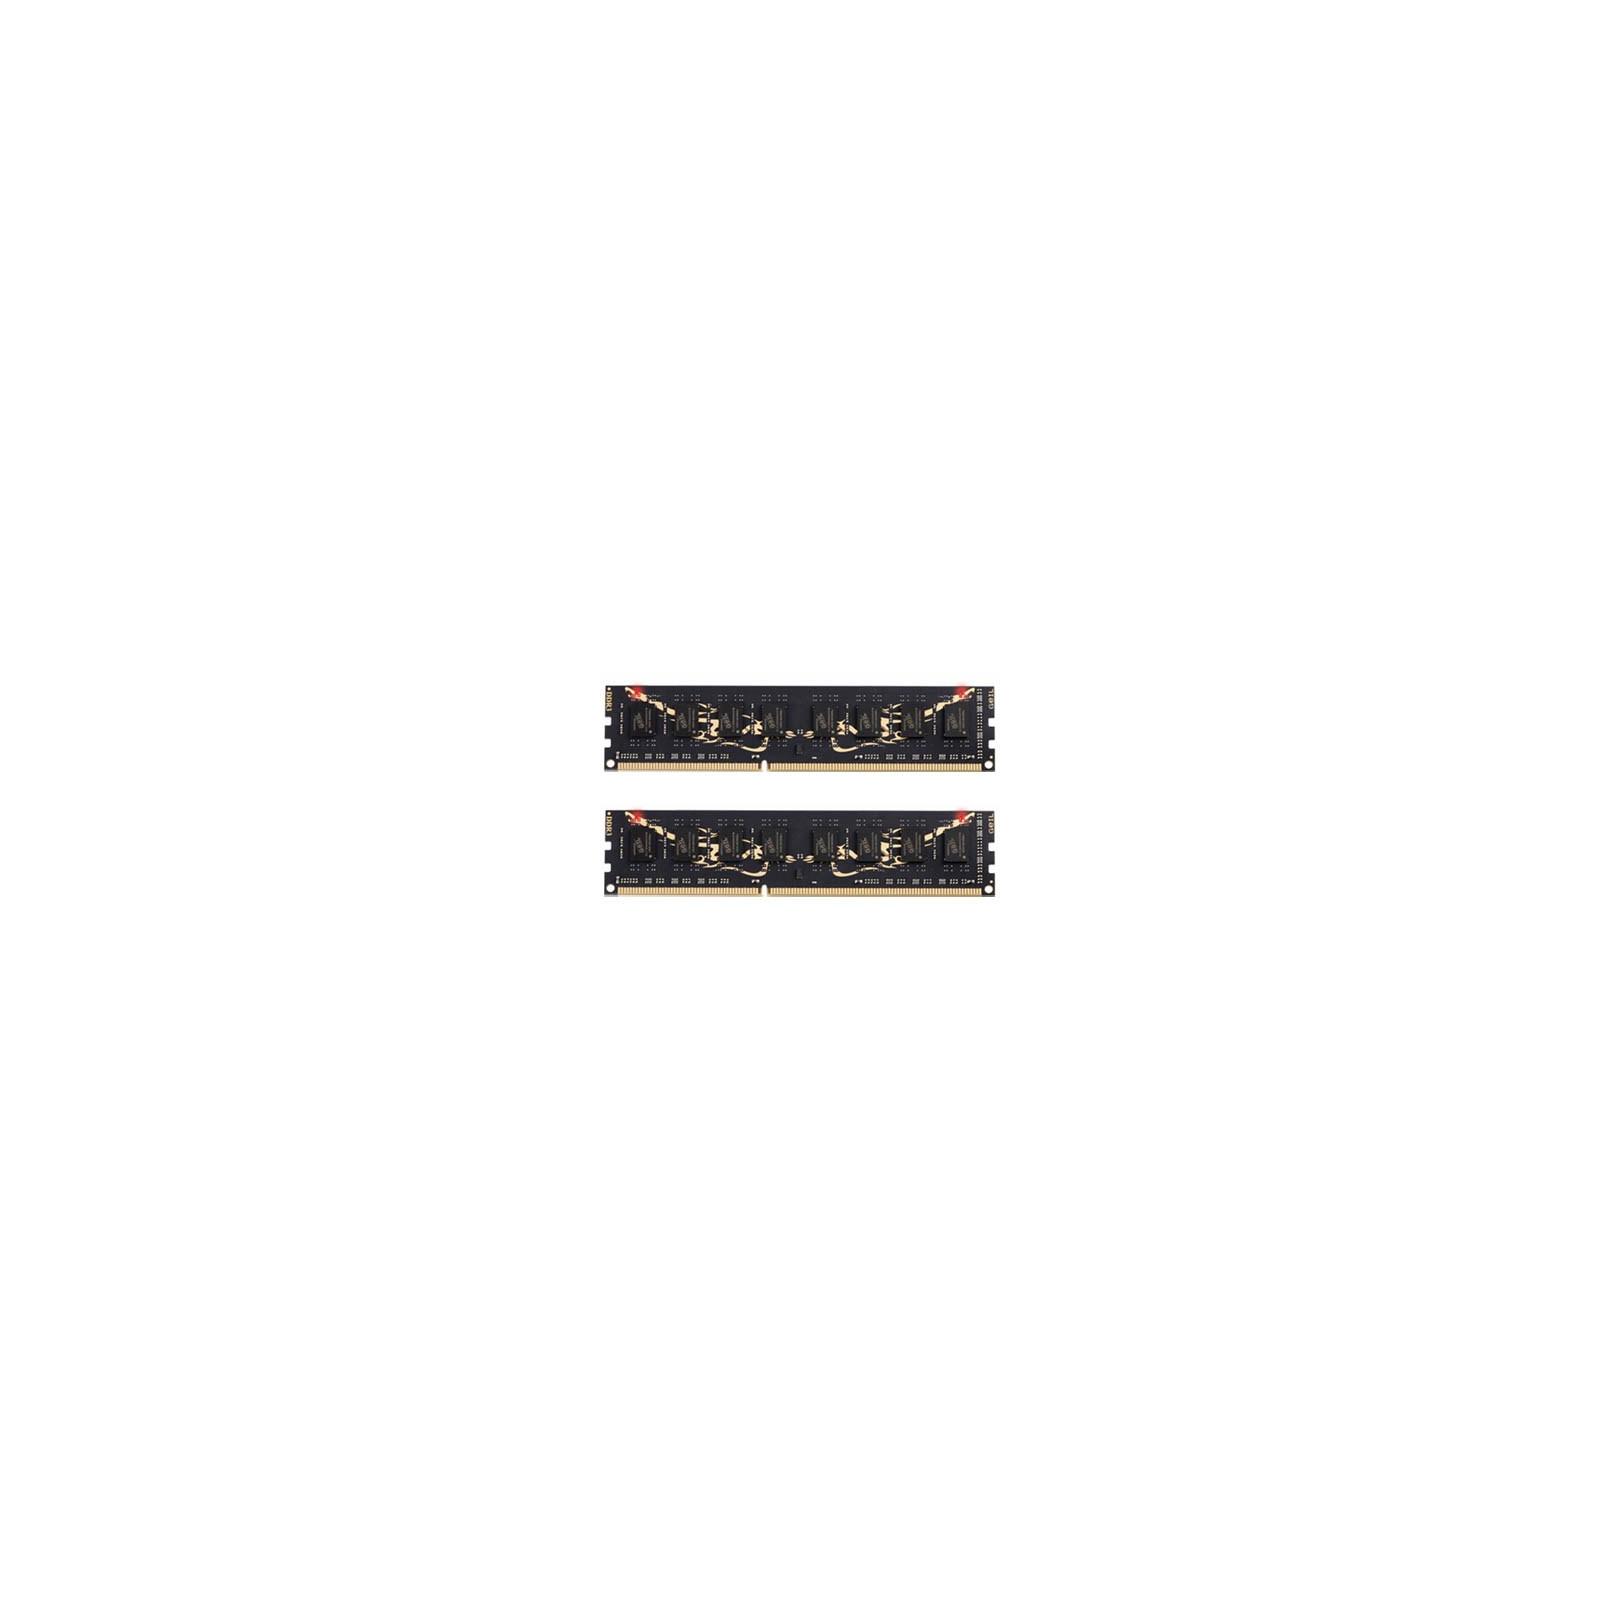 Модуль памяти для компьютера DDR3 8GB (2x4GB) 2133 MHz GEIL (GB38GB2133C11DC)